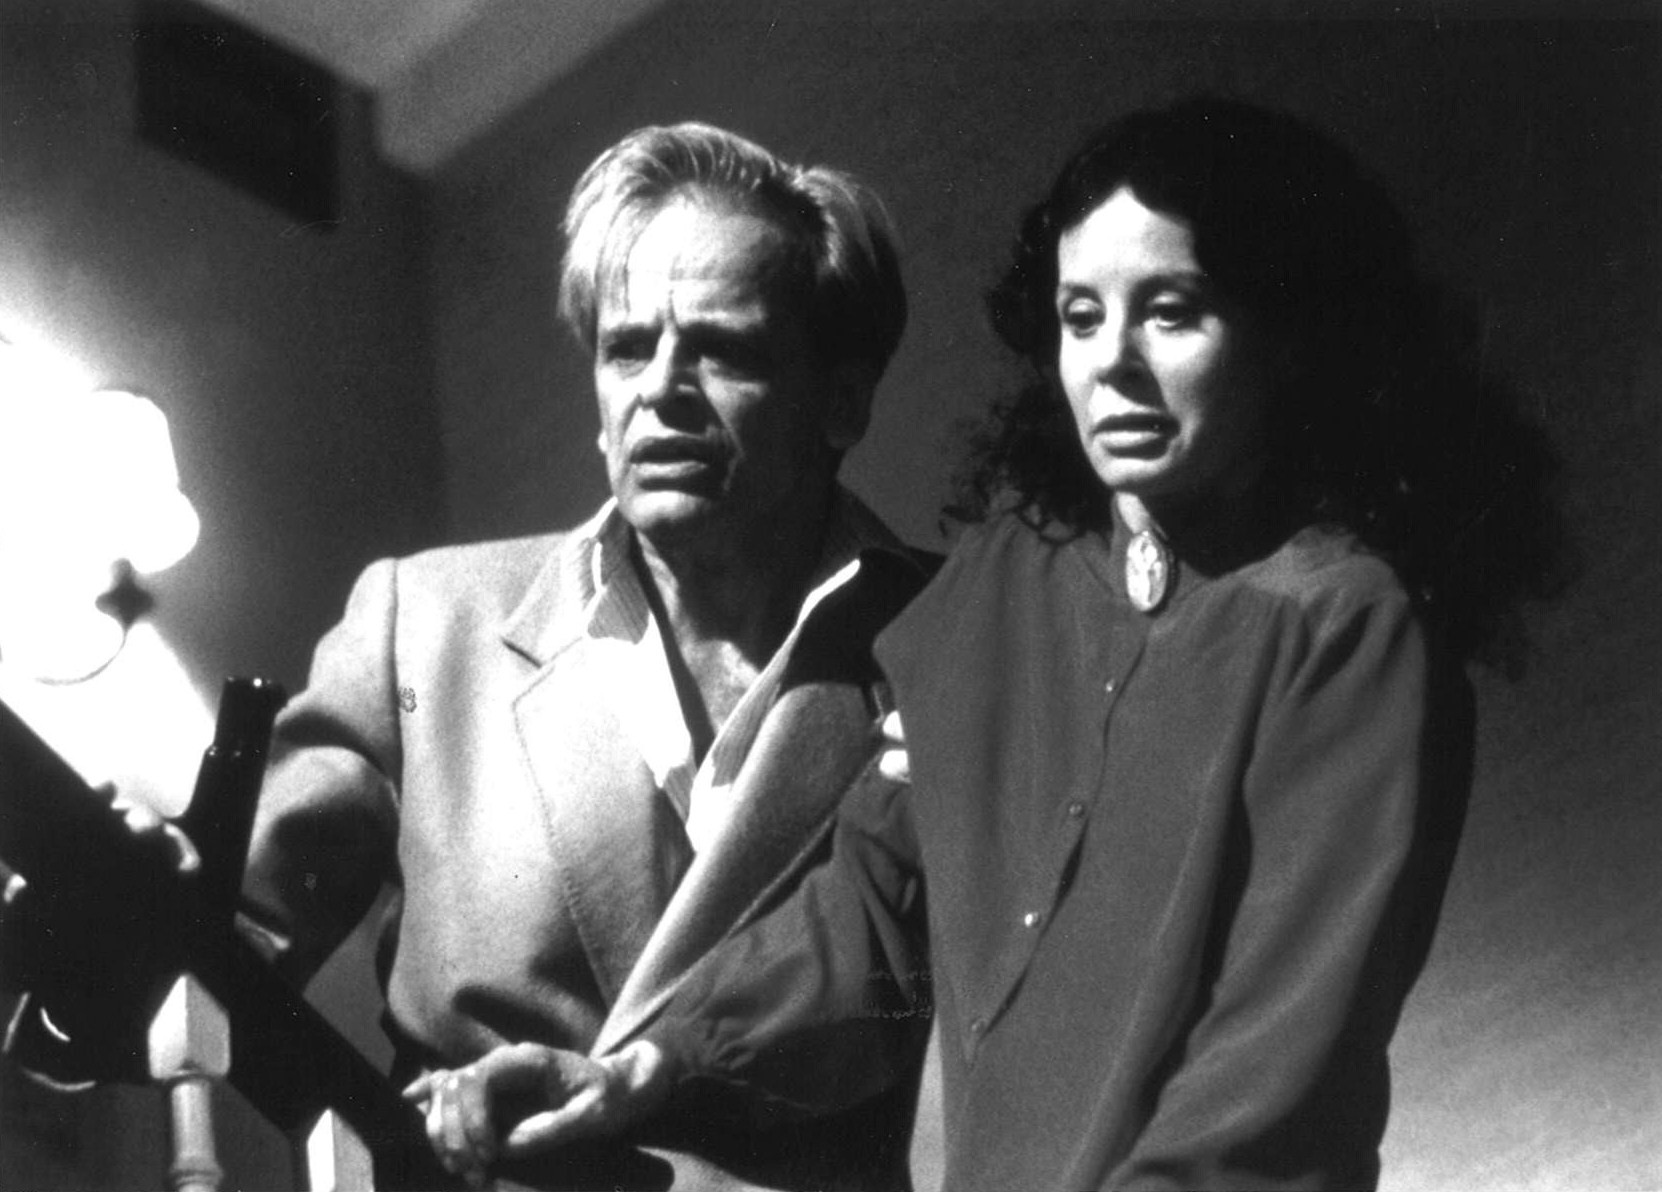 More Klaus Kinski photographs | Du dumme Sau – a Kinski Blog